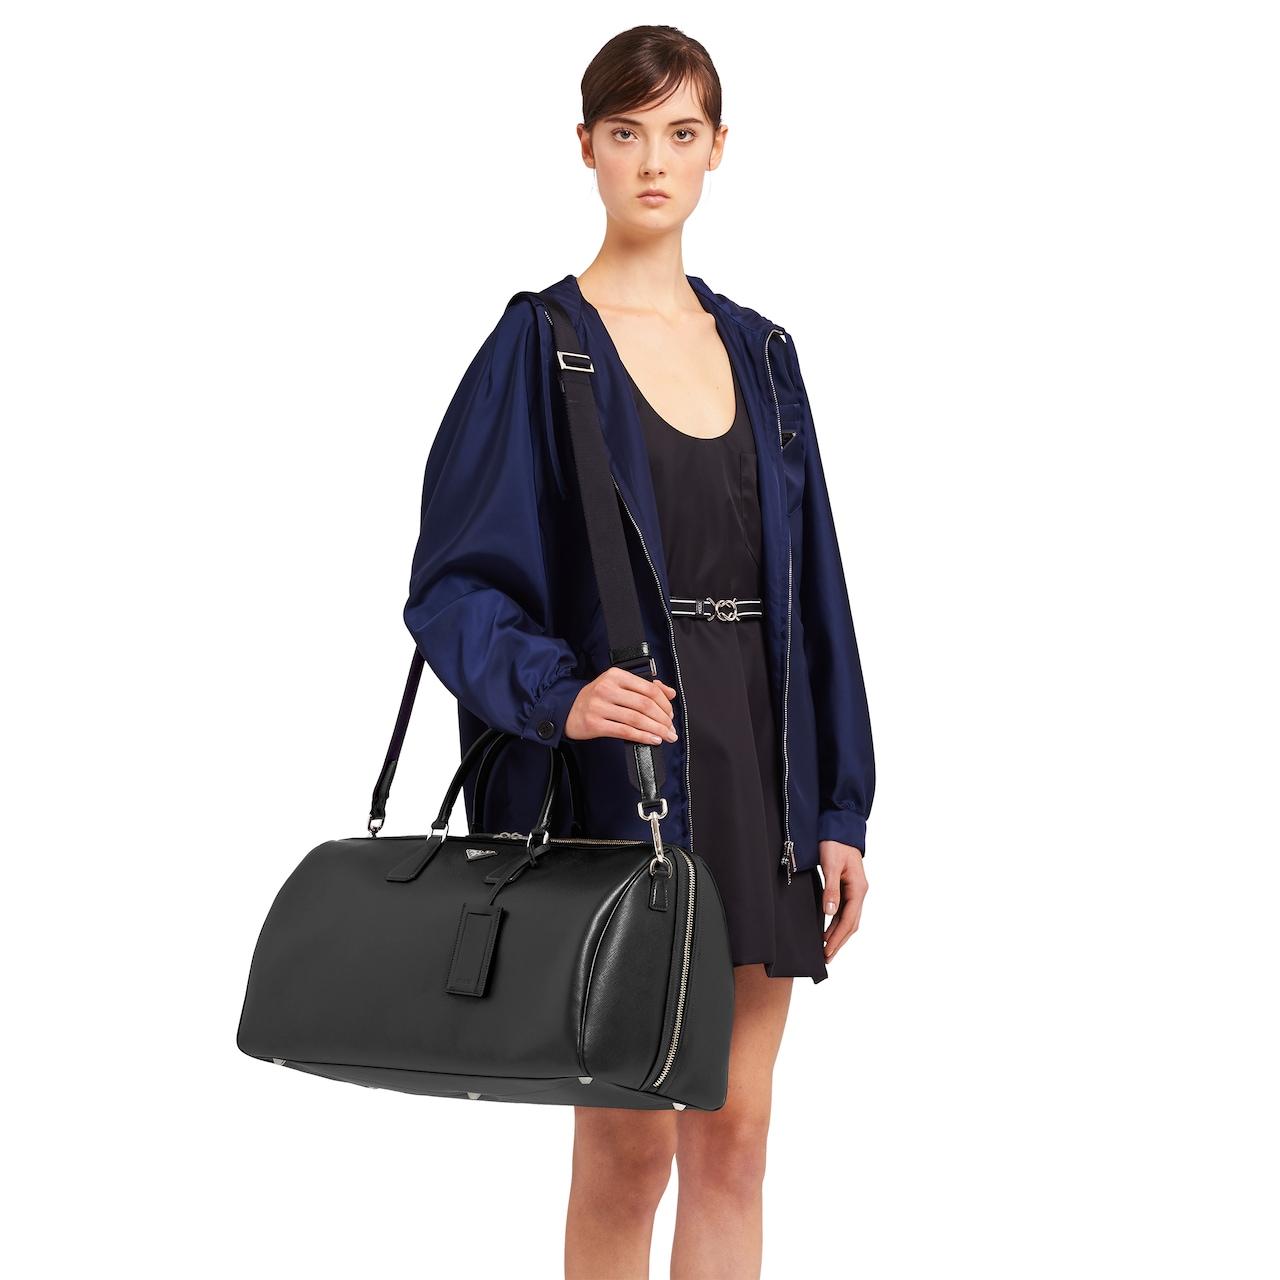 Prada Saffiano leather duffle bag 2